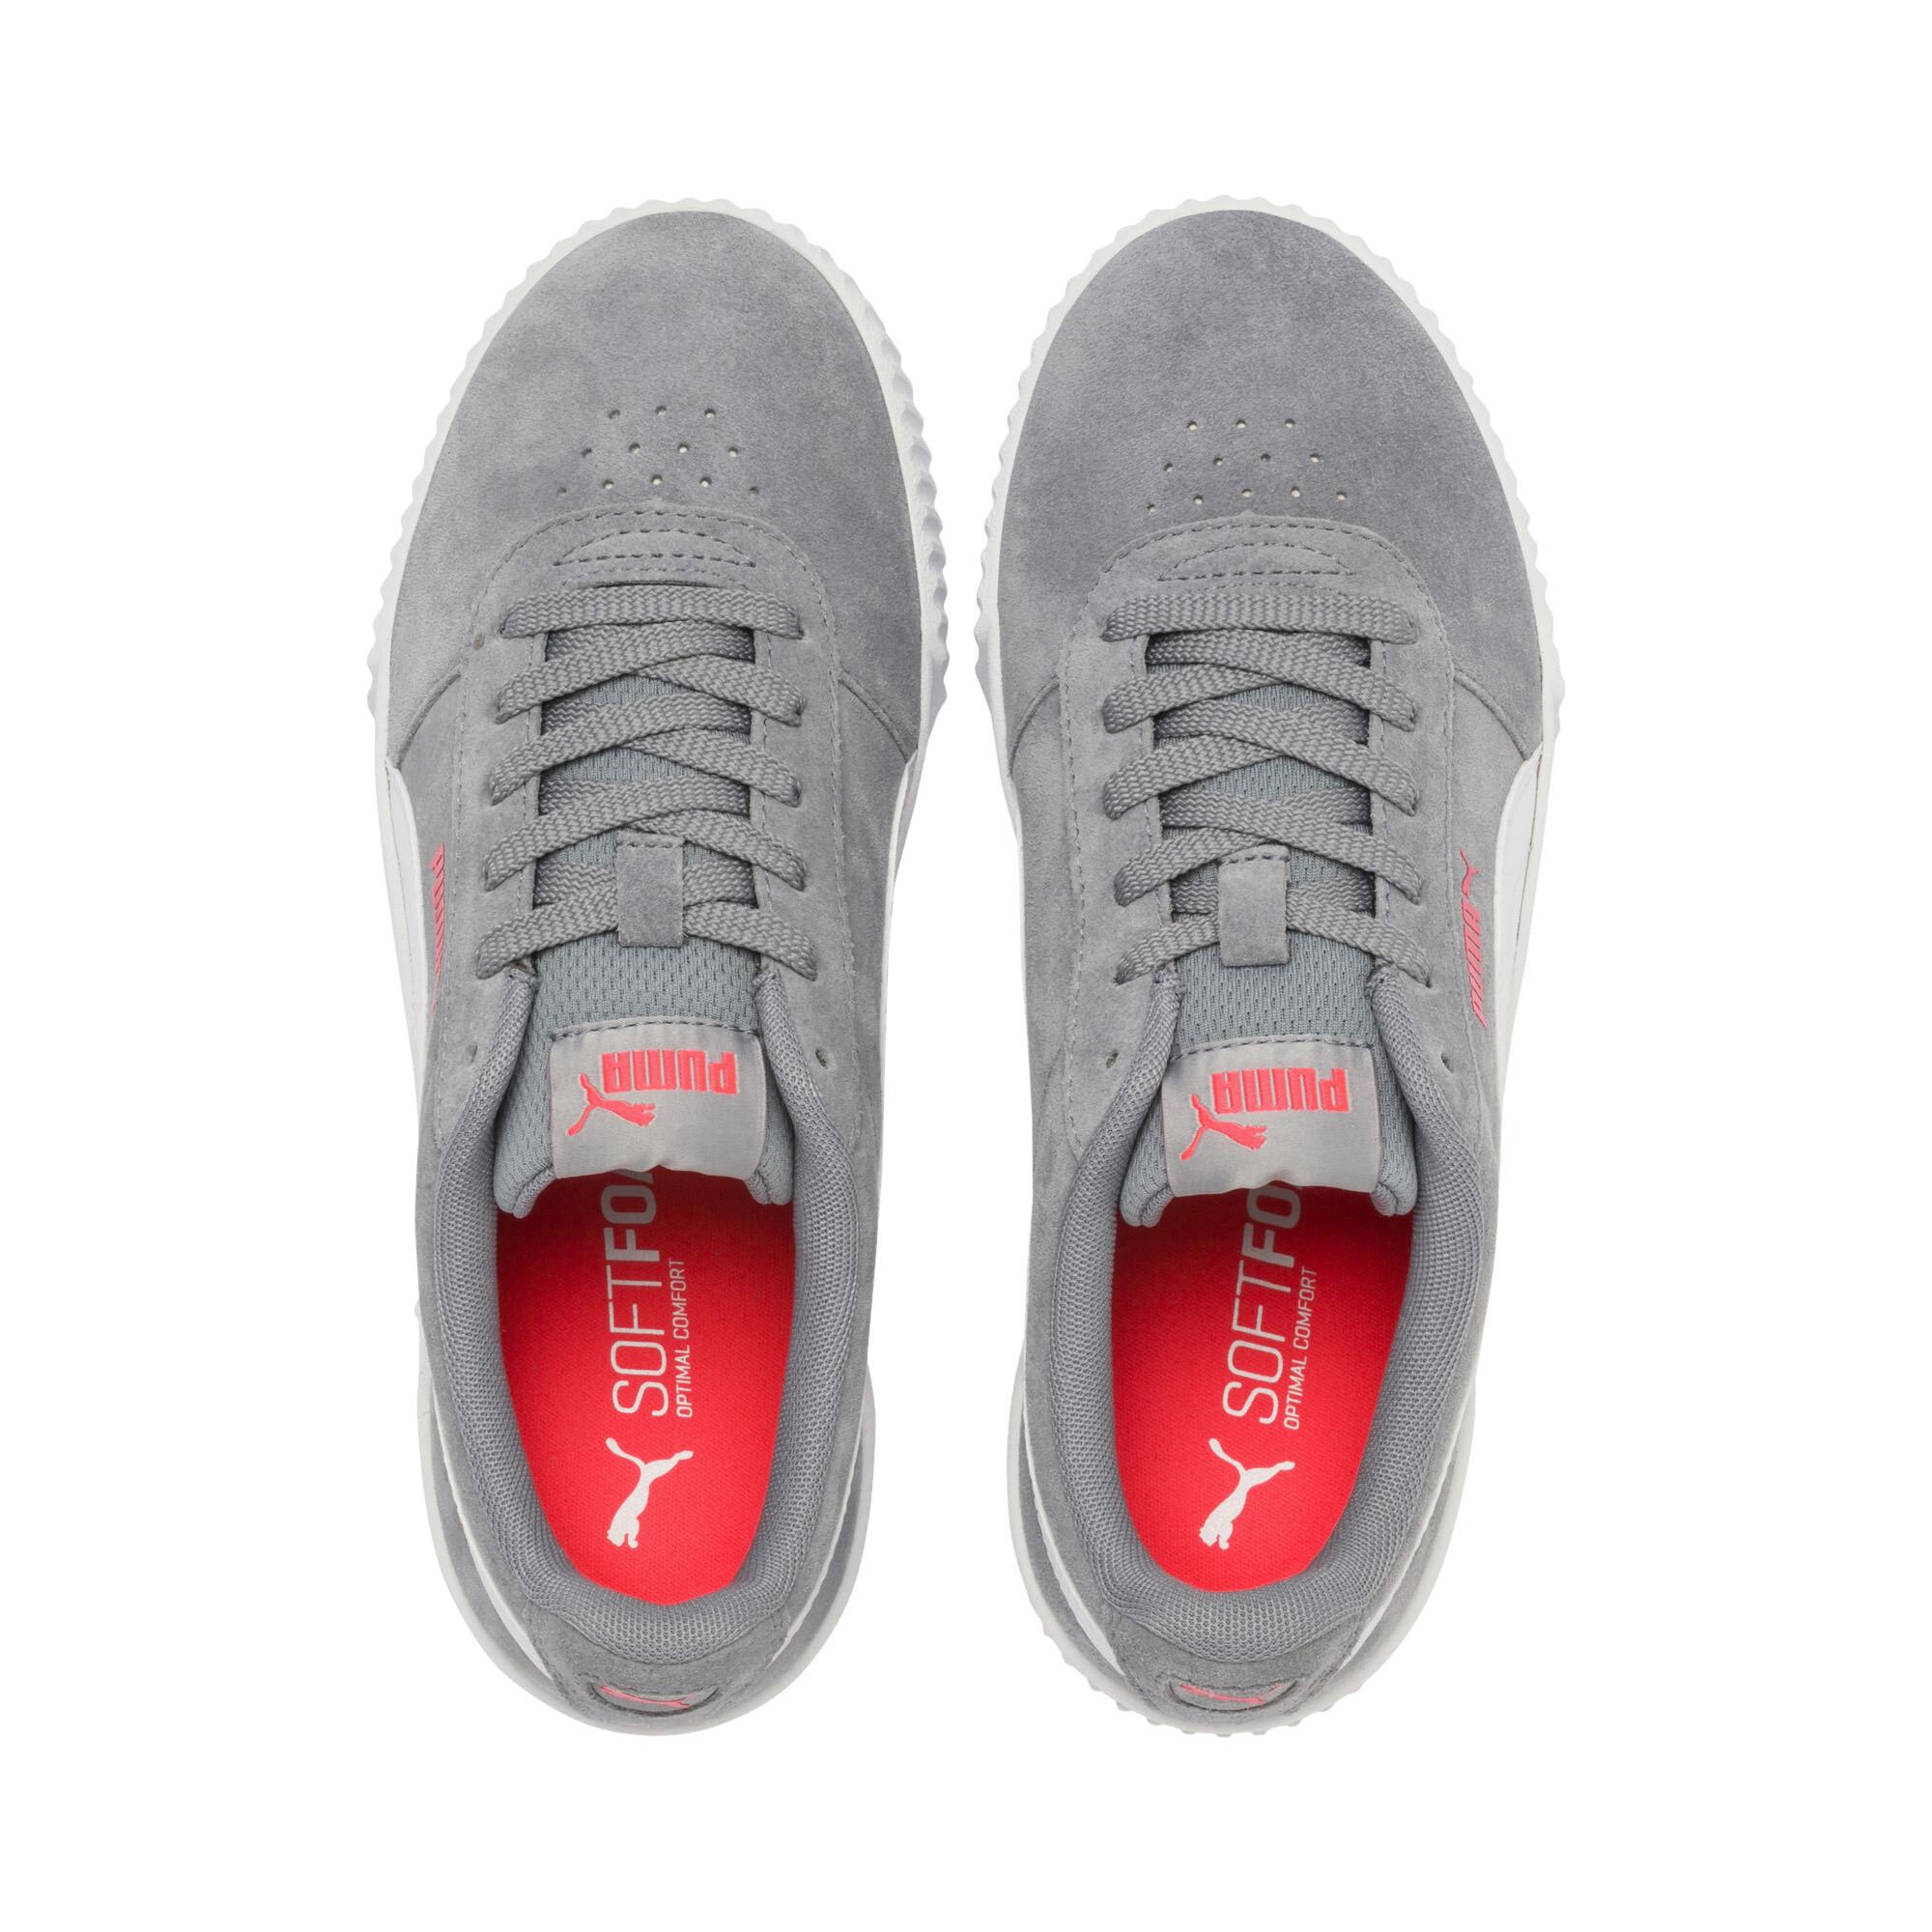 PUMA-Carina-Women-s-Sneakers-Women-Shoe-Basics thumbnail 8